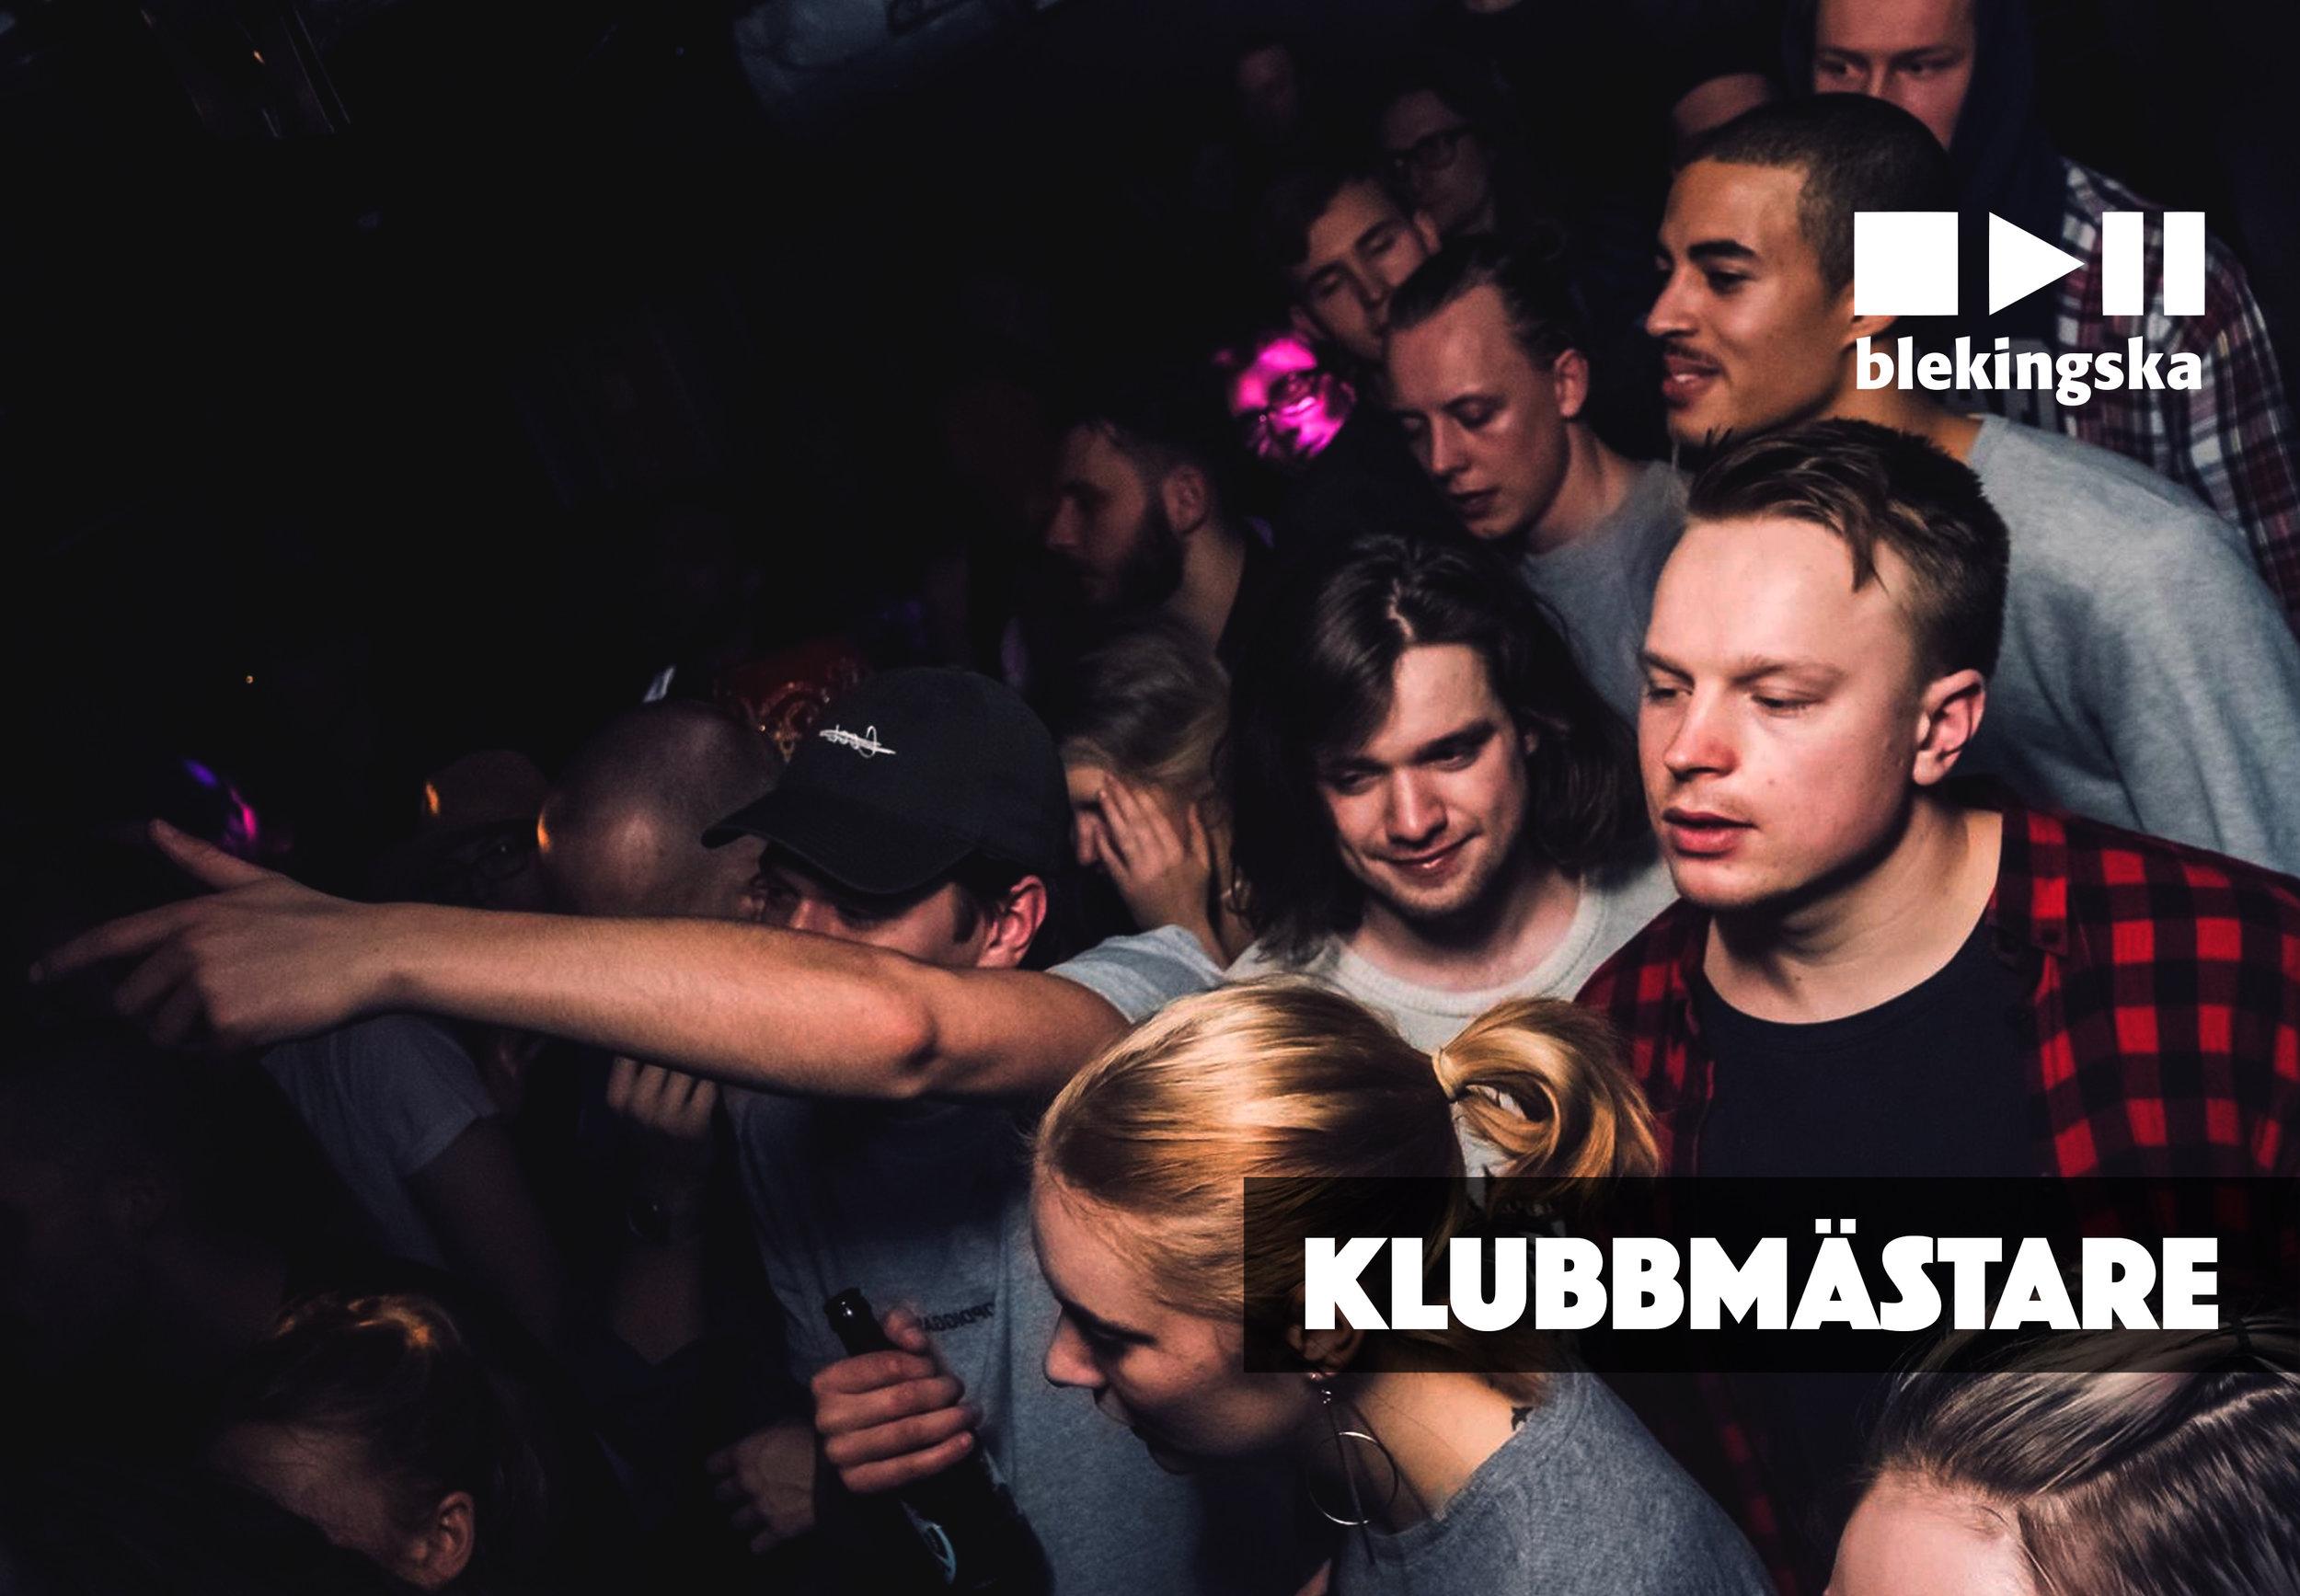 20170302 - källarmästare - Facebook-01.png